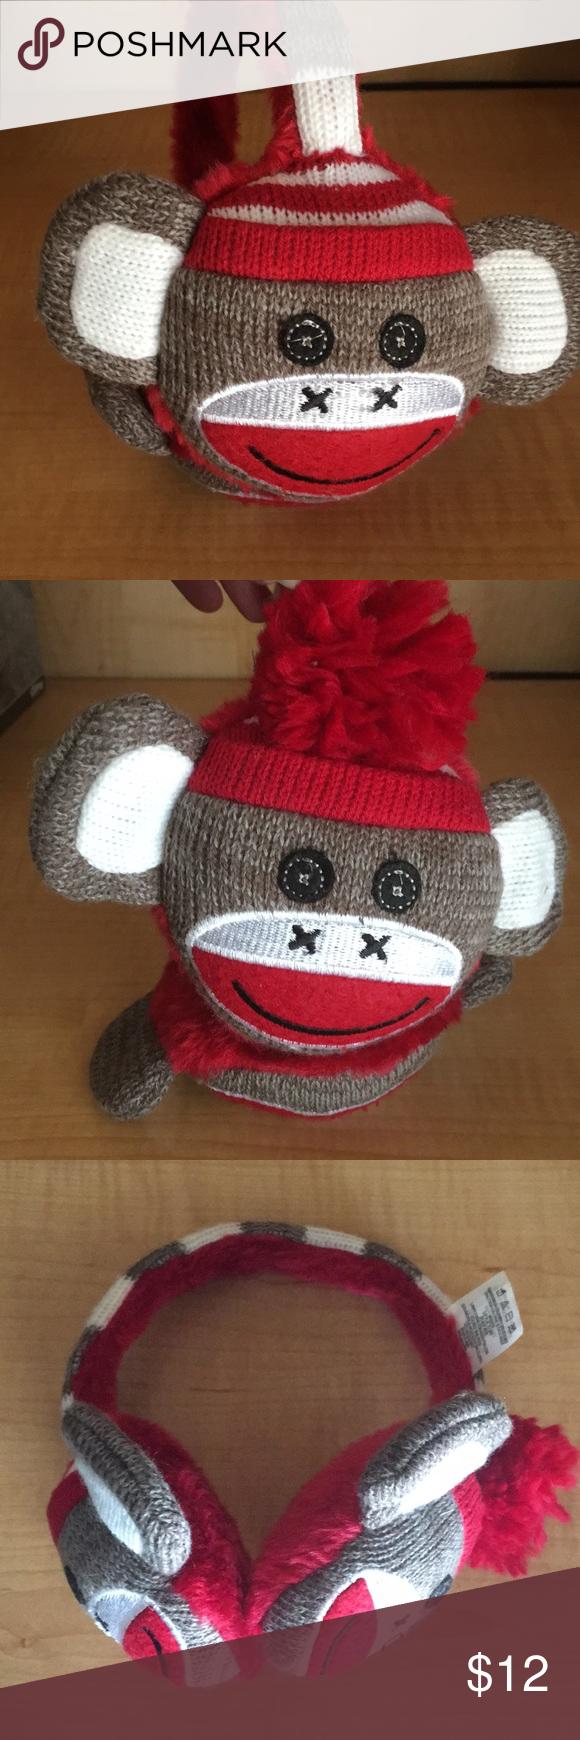 Sock monkey  Sock monkey #sockmoneky